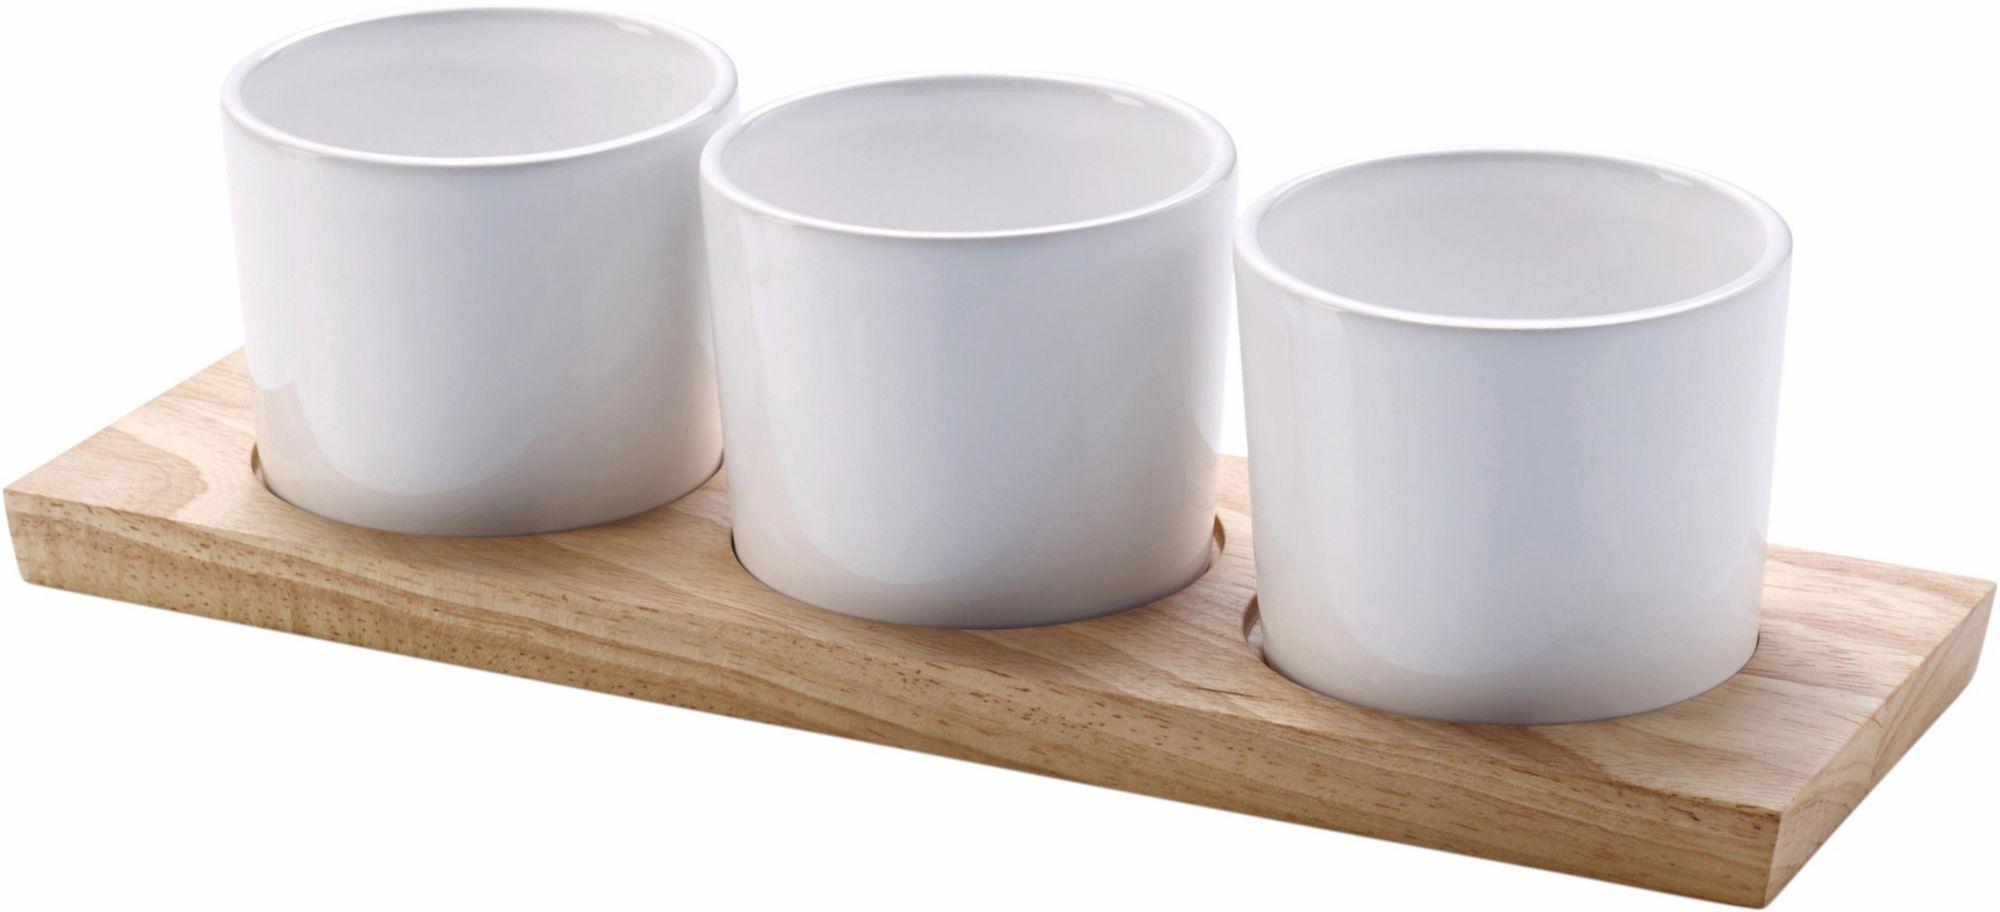 CONTINENTA  Servier-Set, Keramik, Handarbeit